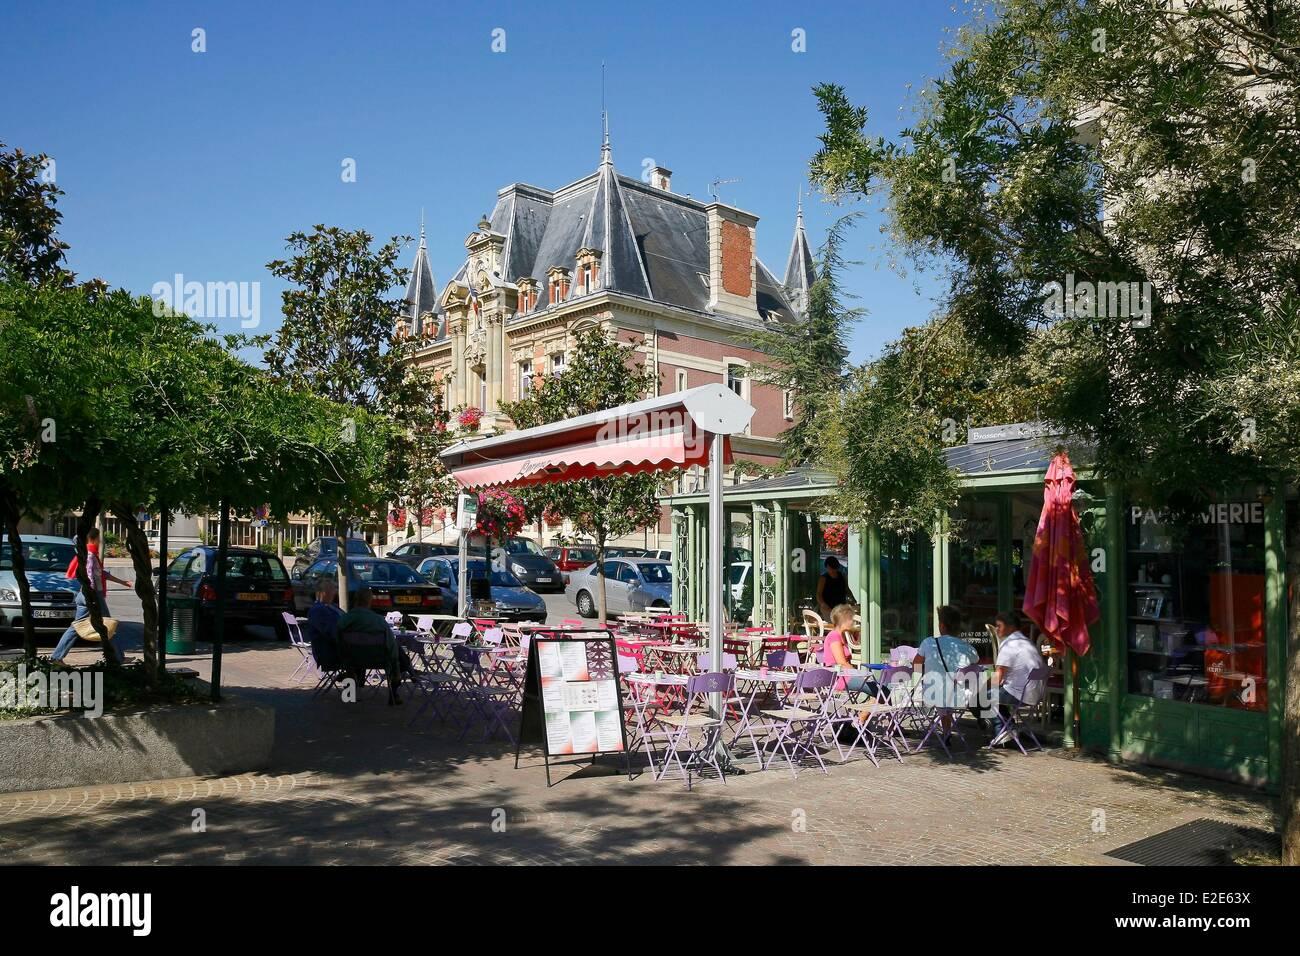 resto rueil malmaison 92 perfect okko hotels paris restaurant with resto rueil malmaison 92. Black Bedroom Furniture Sets. Home Design Ideas